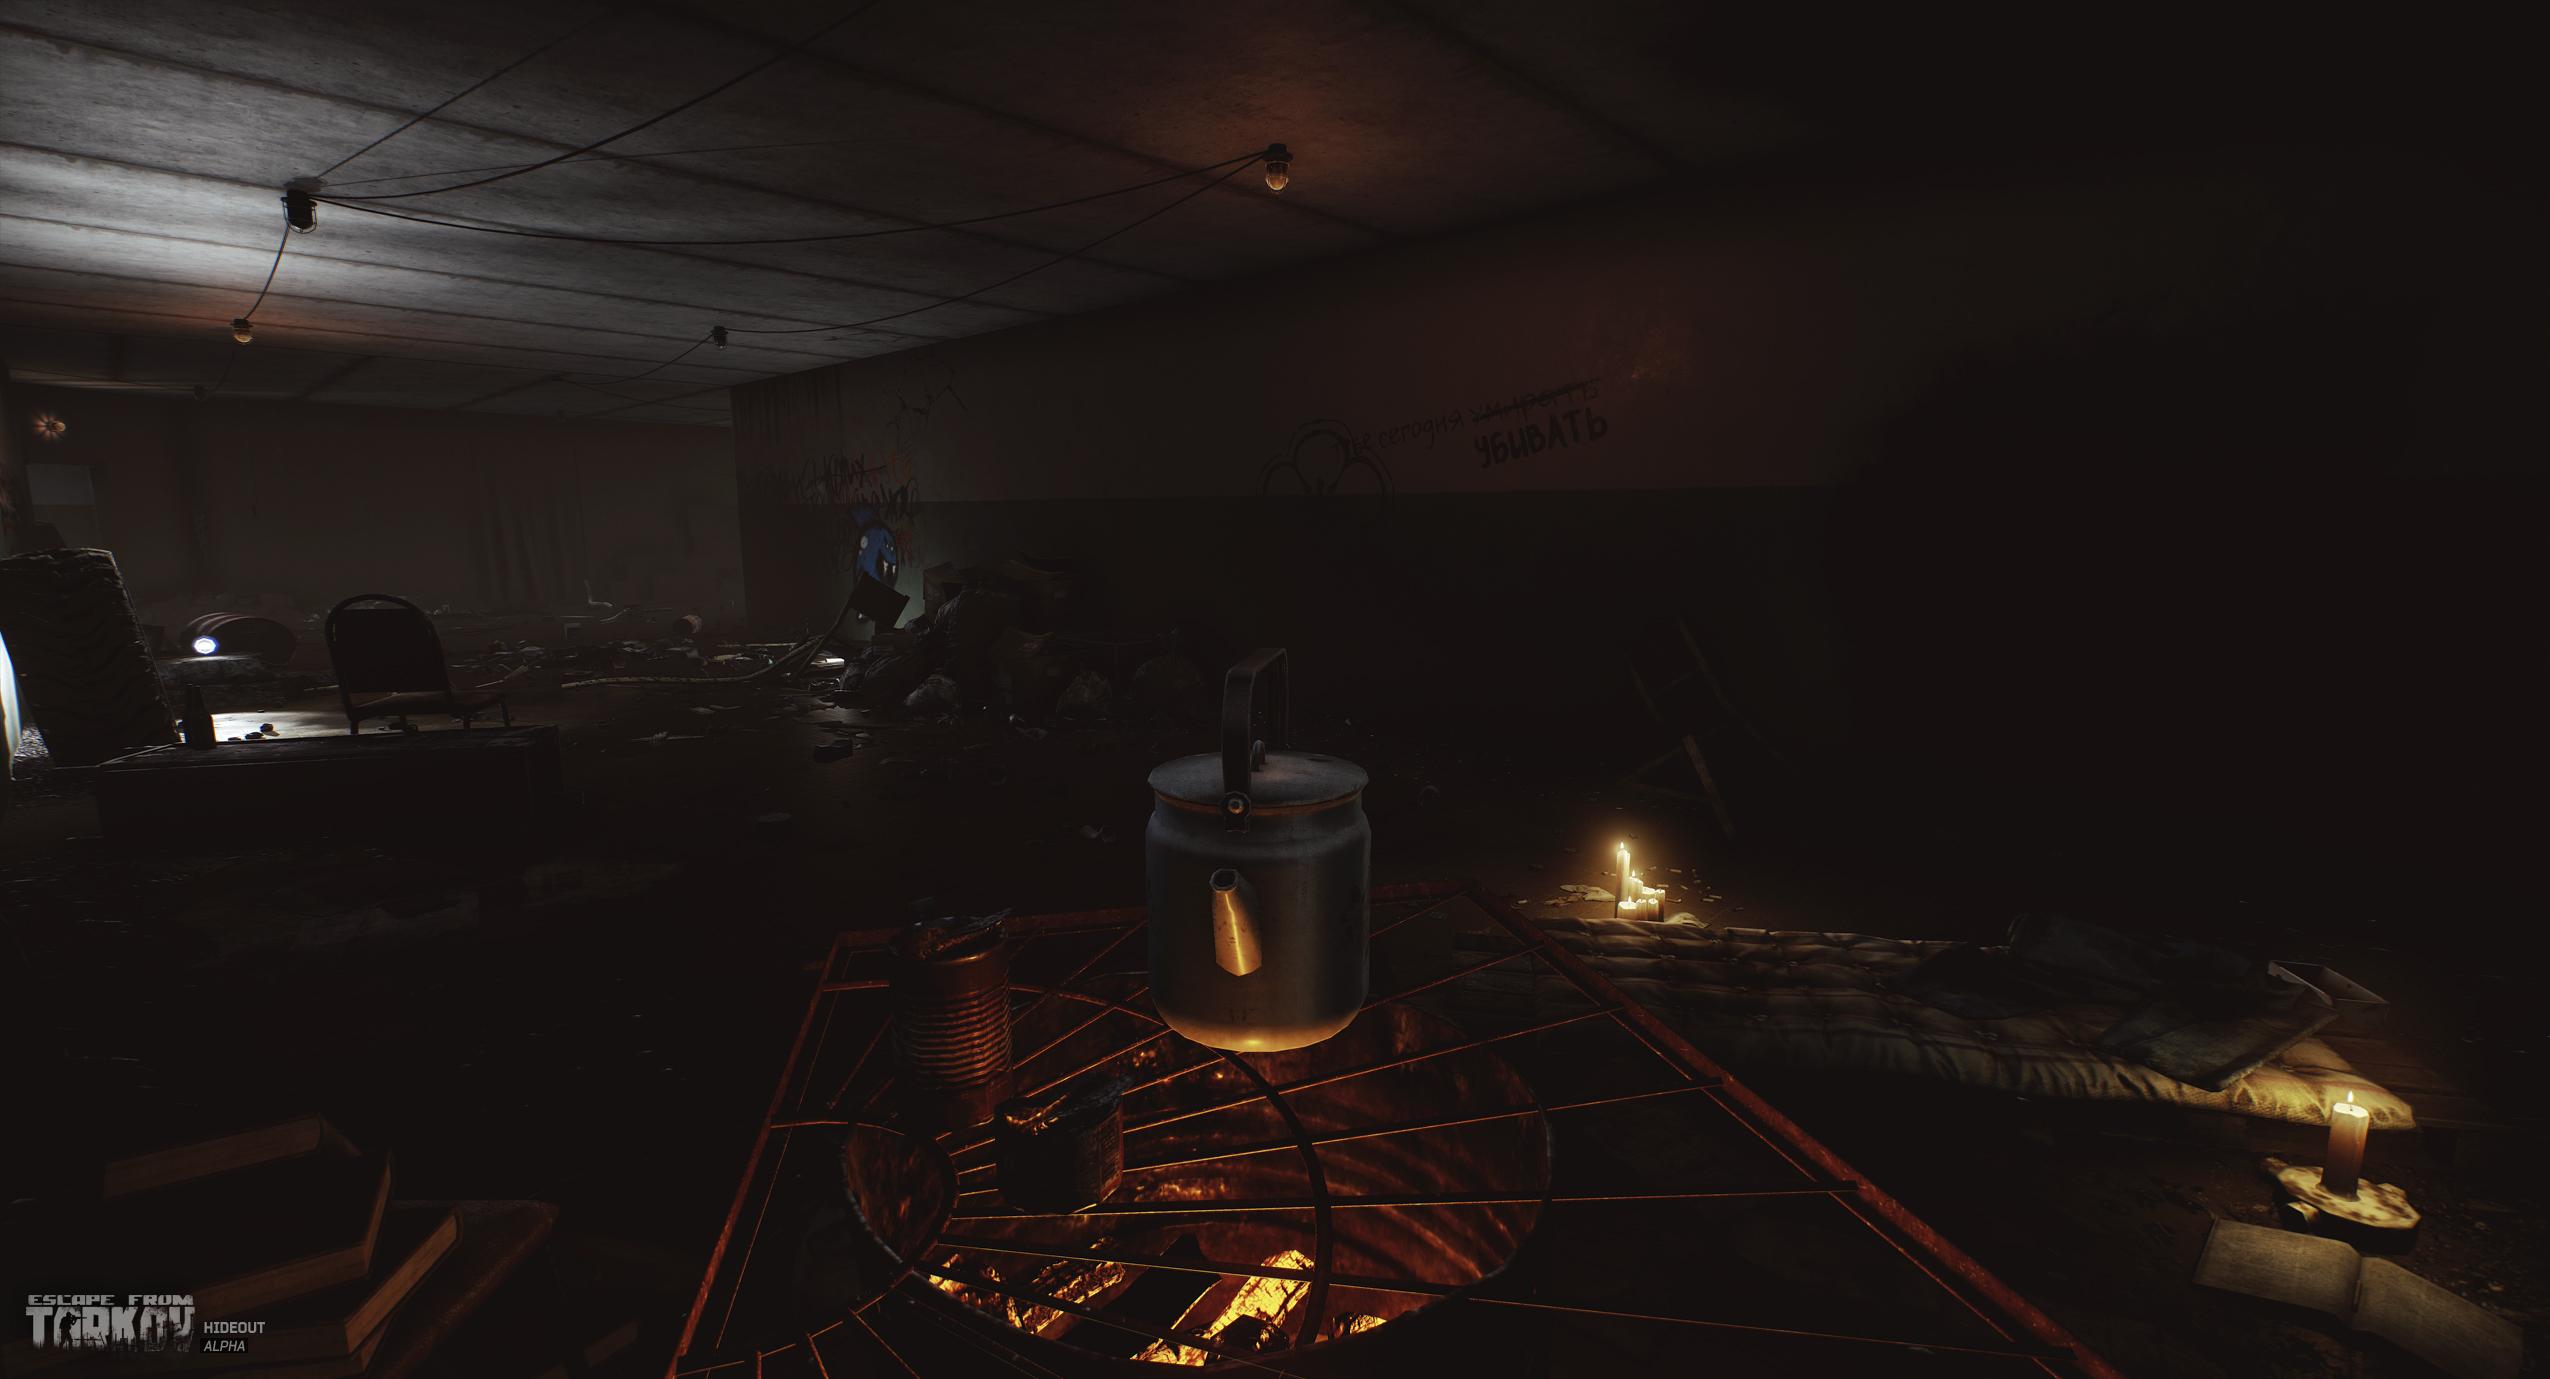 escapefromtarkov_hideout5.jpg